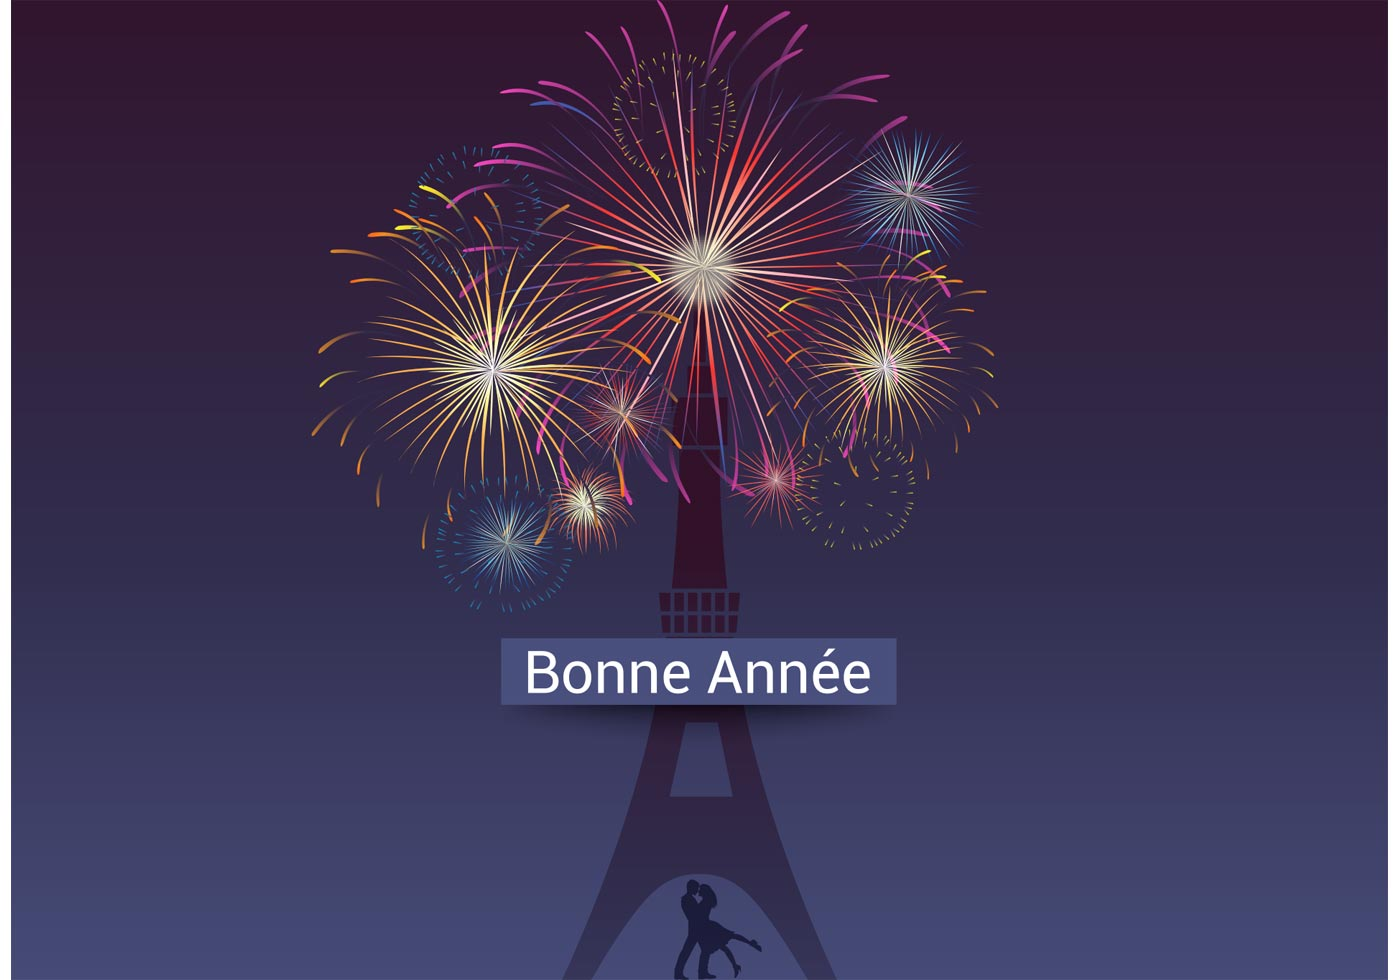 Year Calendar Vector : Free vector bonne année fireworks download